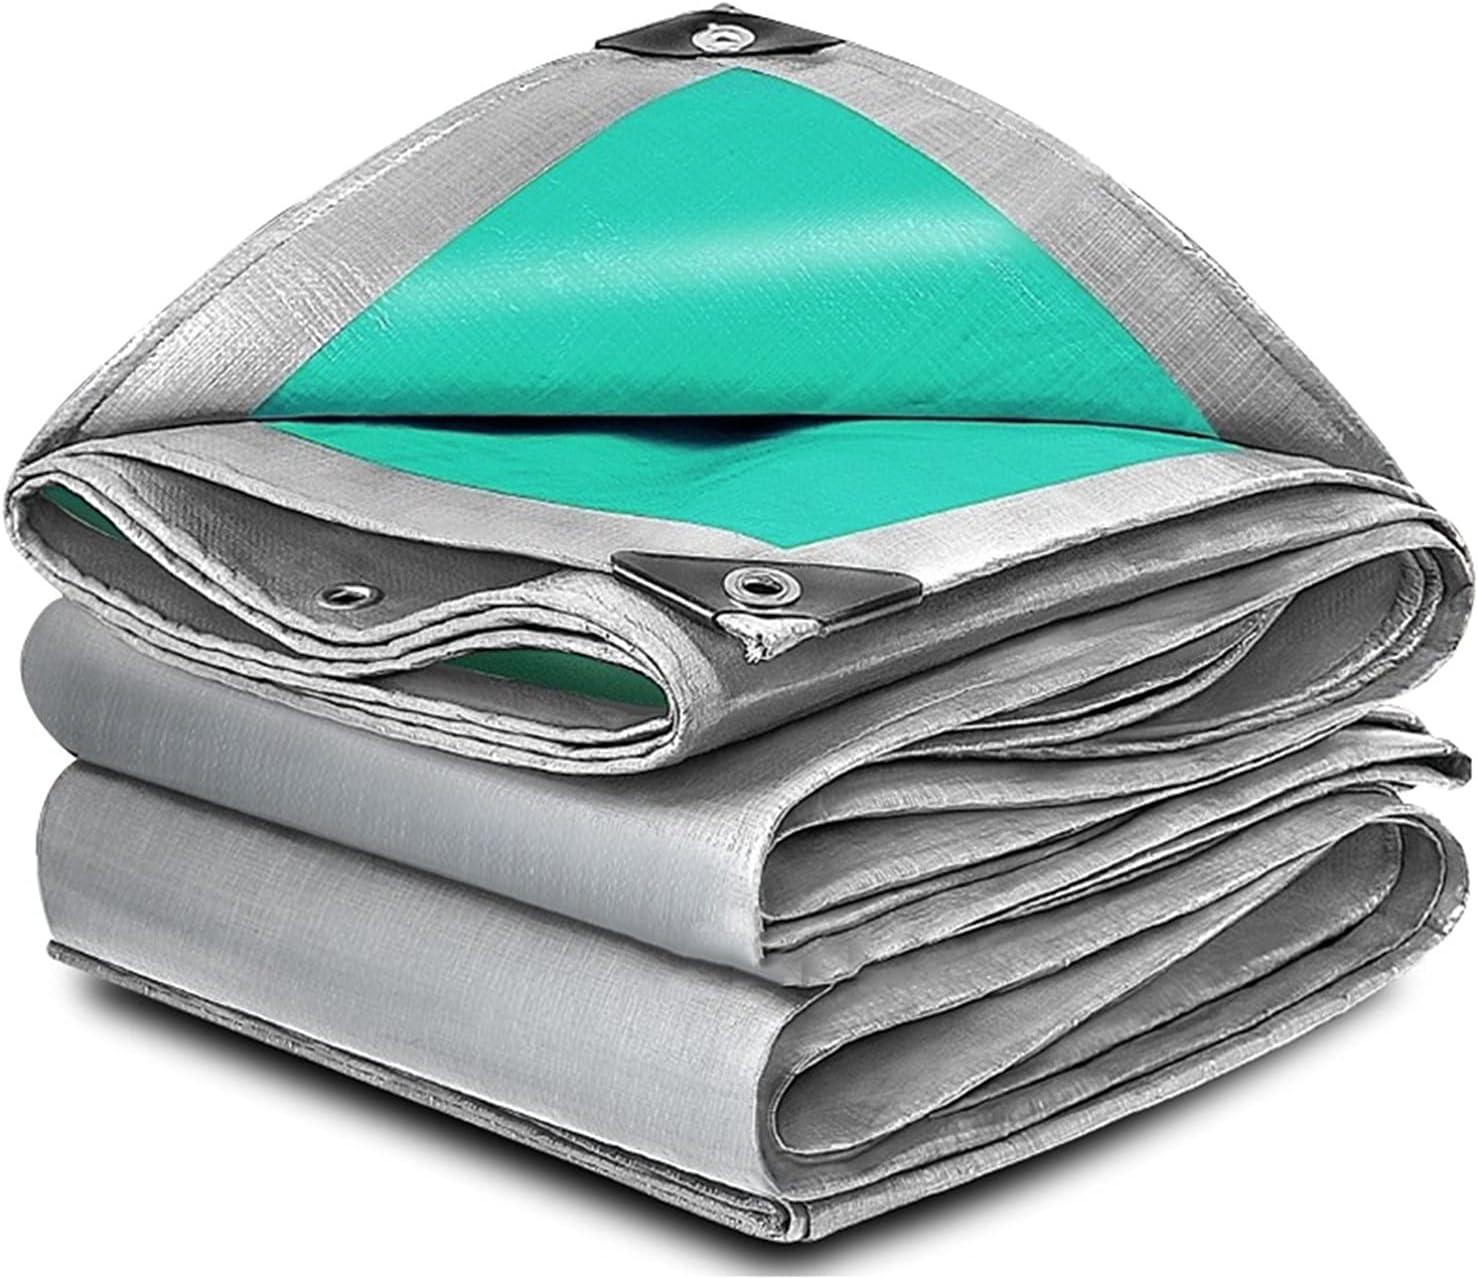 ZHYLing 0.32mm Truck Canopys Now on sale PE Tarpaulin Garden Rainproof Outstanding Cloth